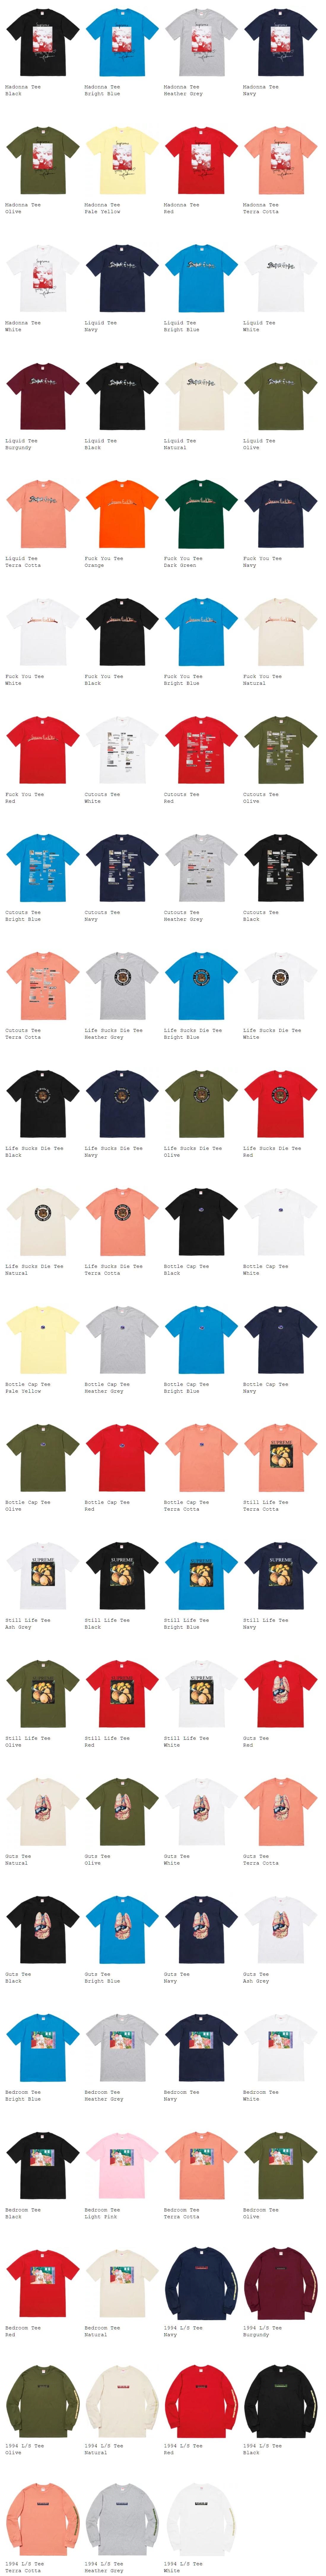 supreme シュプリーム 18fw week1(立ち上げ) オンライン配置 Tシャツ